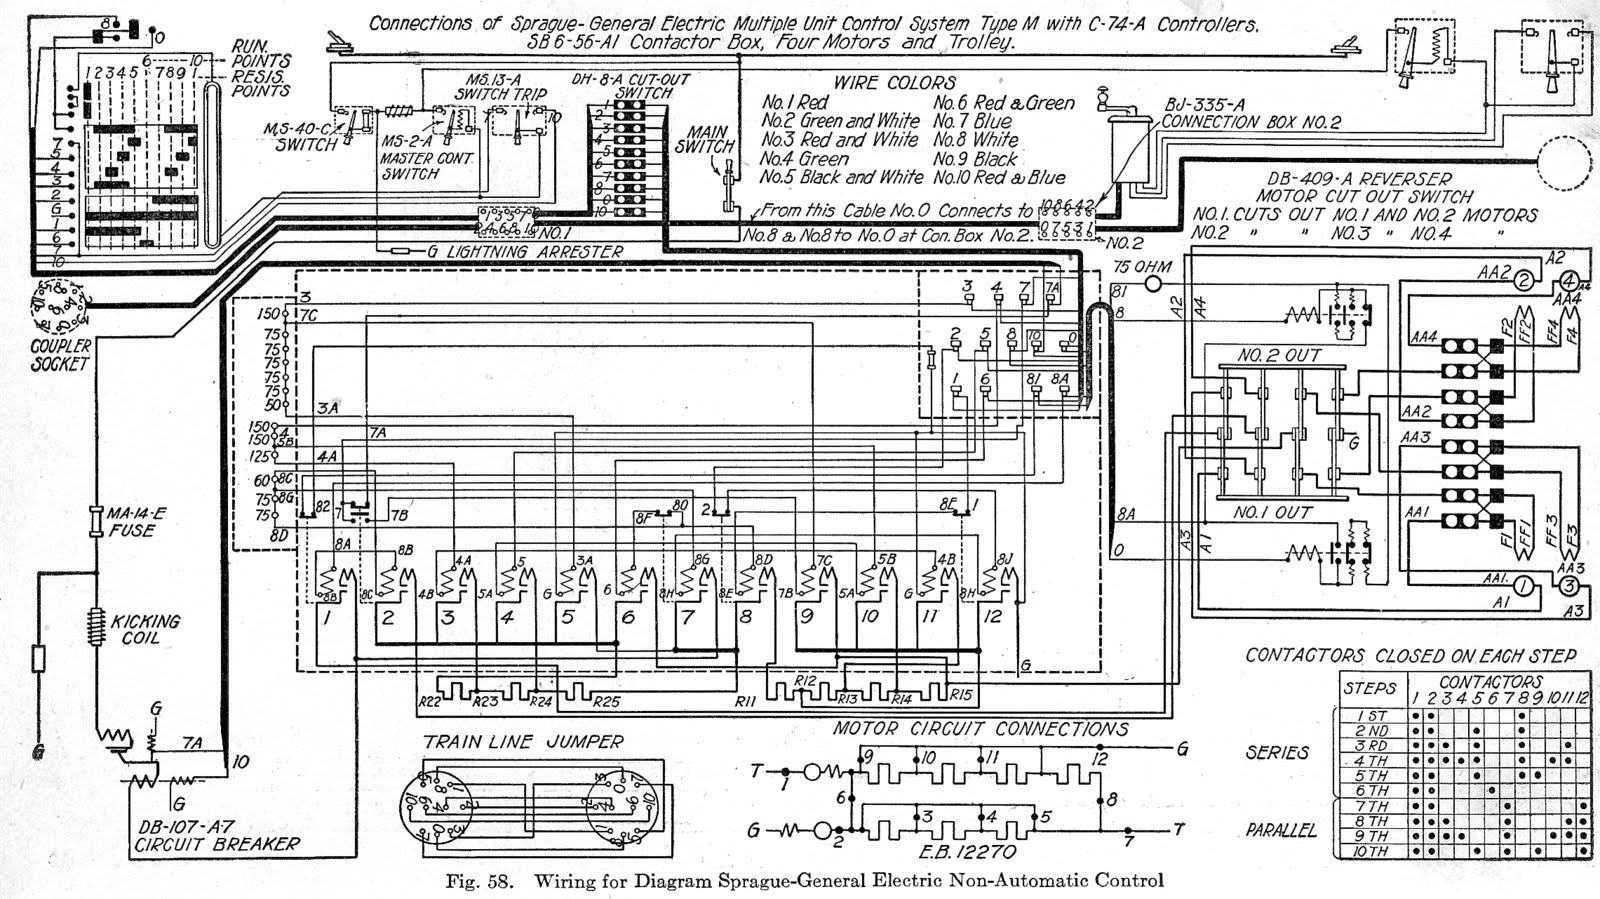 diagram perkins sel engine wiring diagram on massey ferguson wiring  diagram, meyers e47 switch